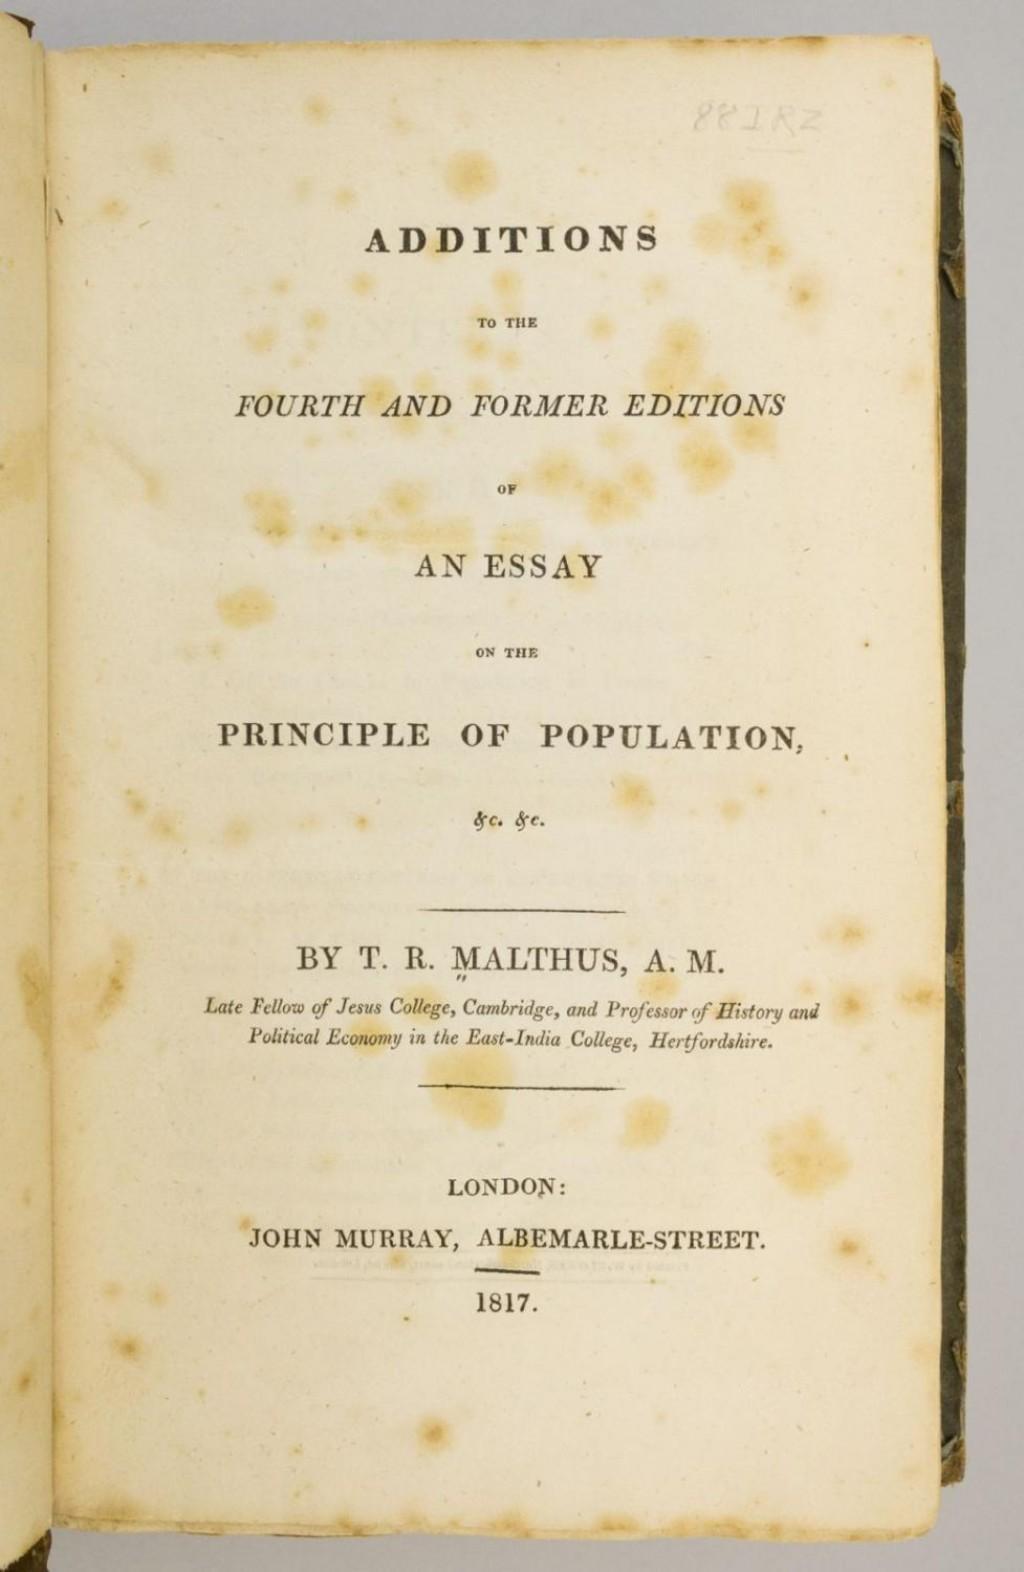 002 Essay Example On The Principle Of Population 5337830061 2 Singular Pdf By Thomas Malthus Main Idea Large